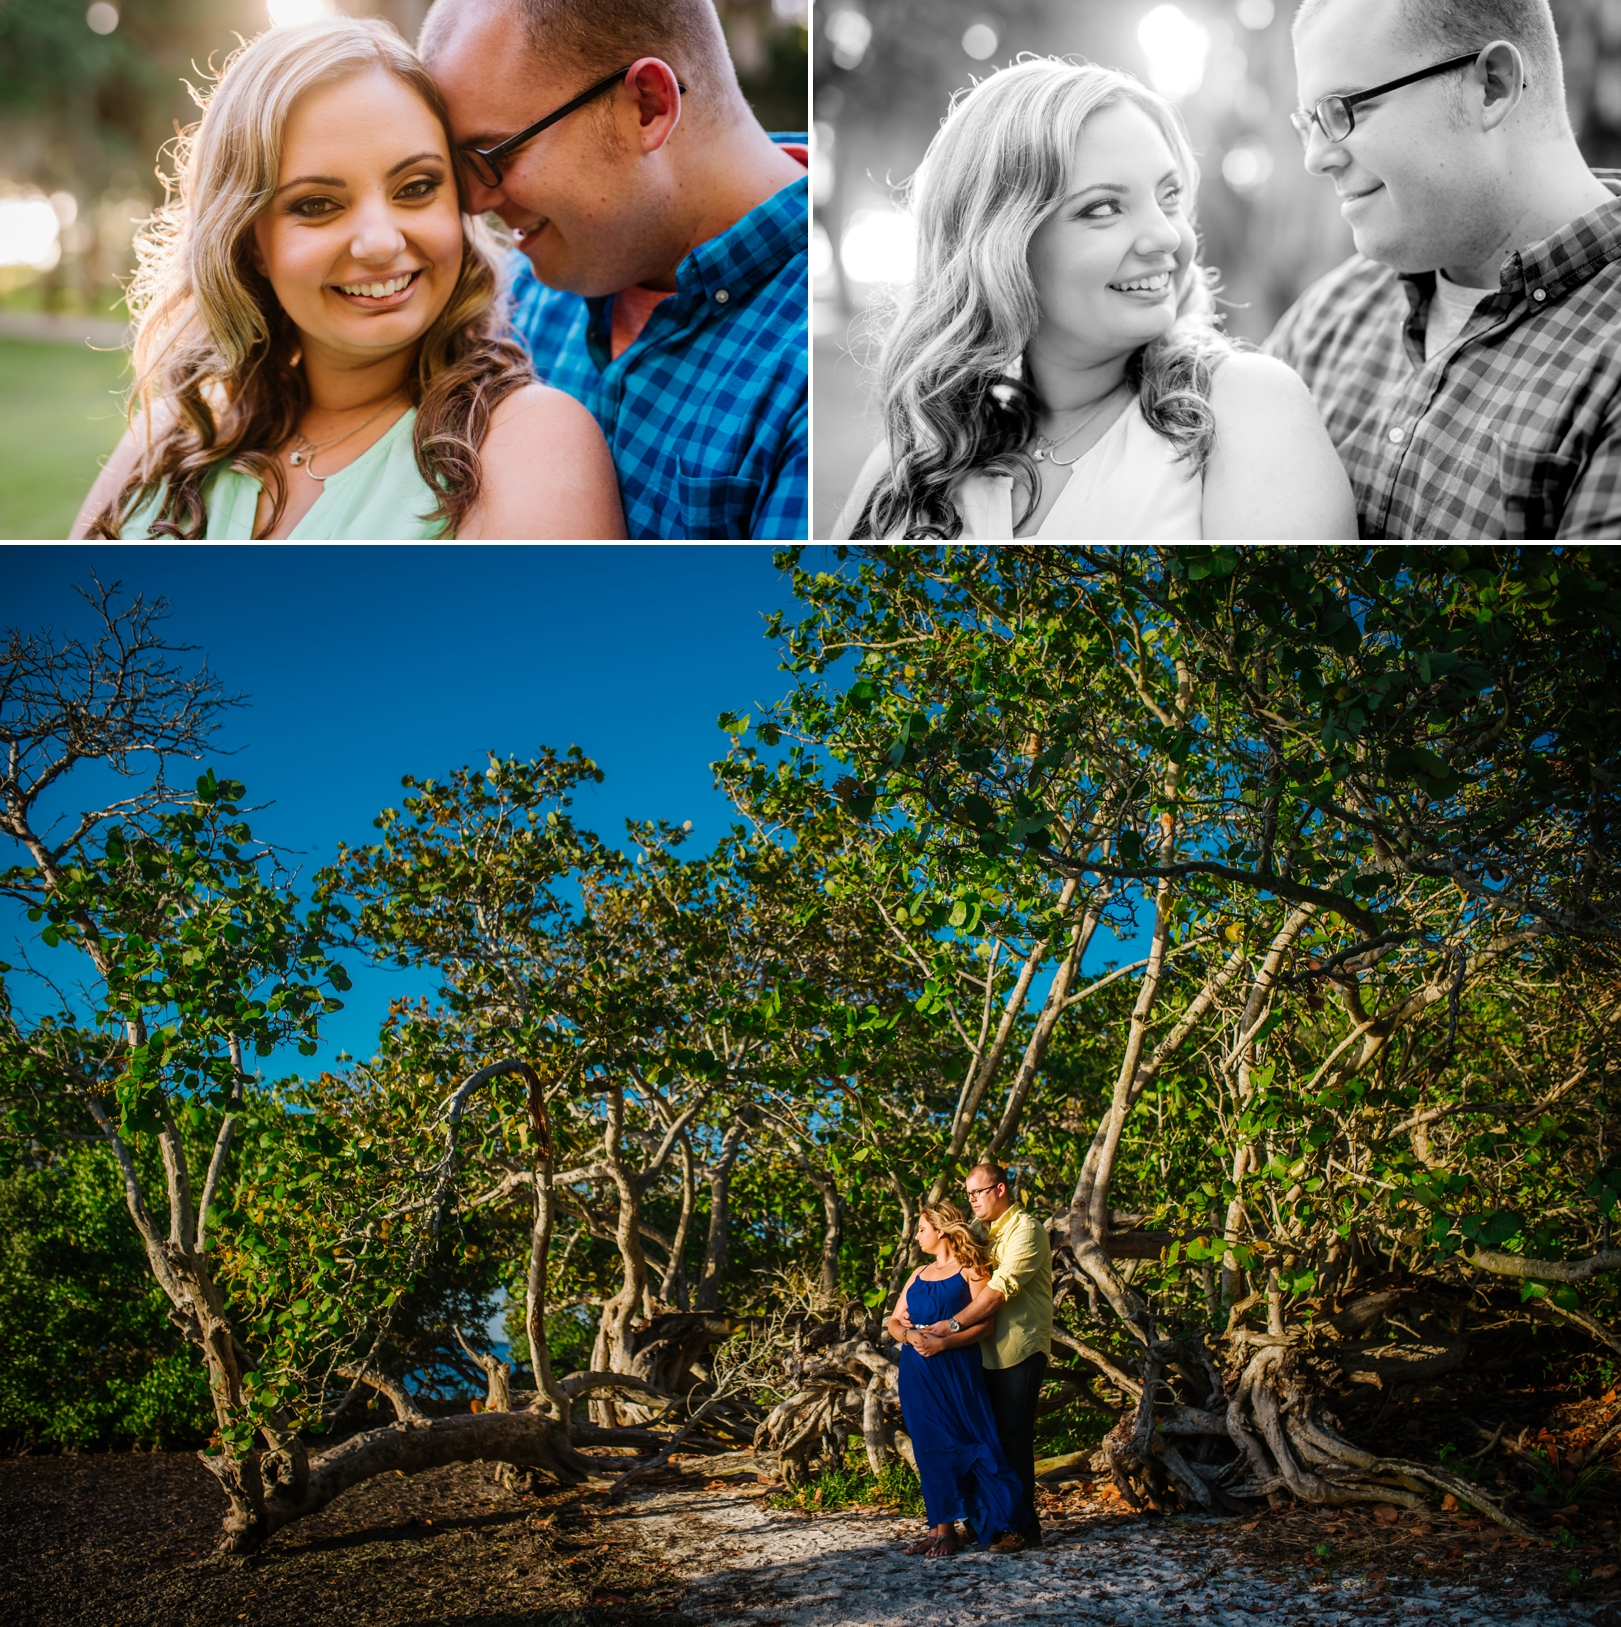 tampa-wedding-photographer-nature-engagement_0004.jpg